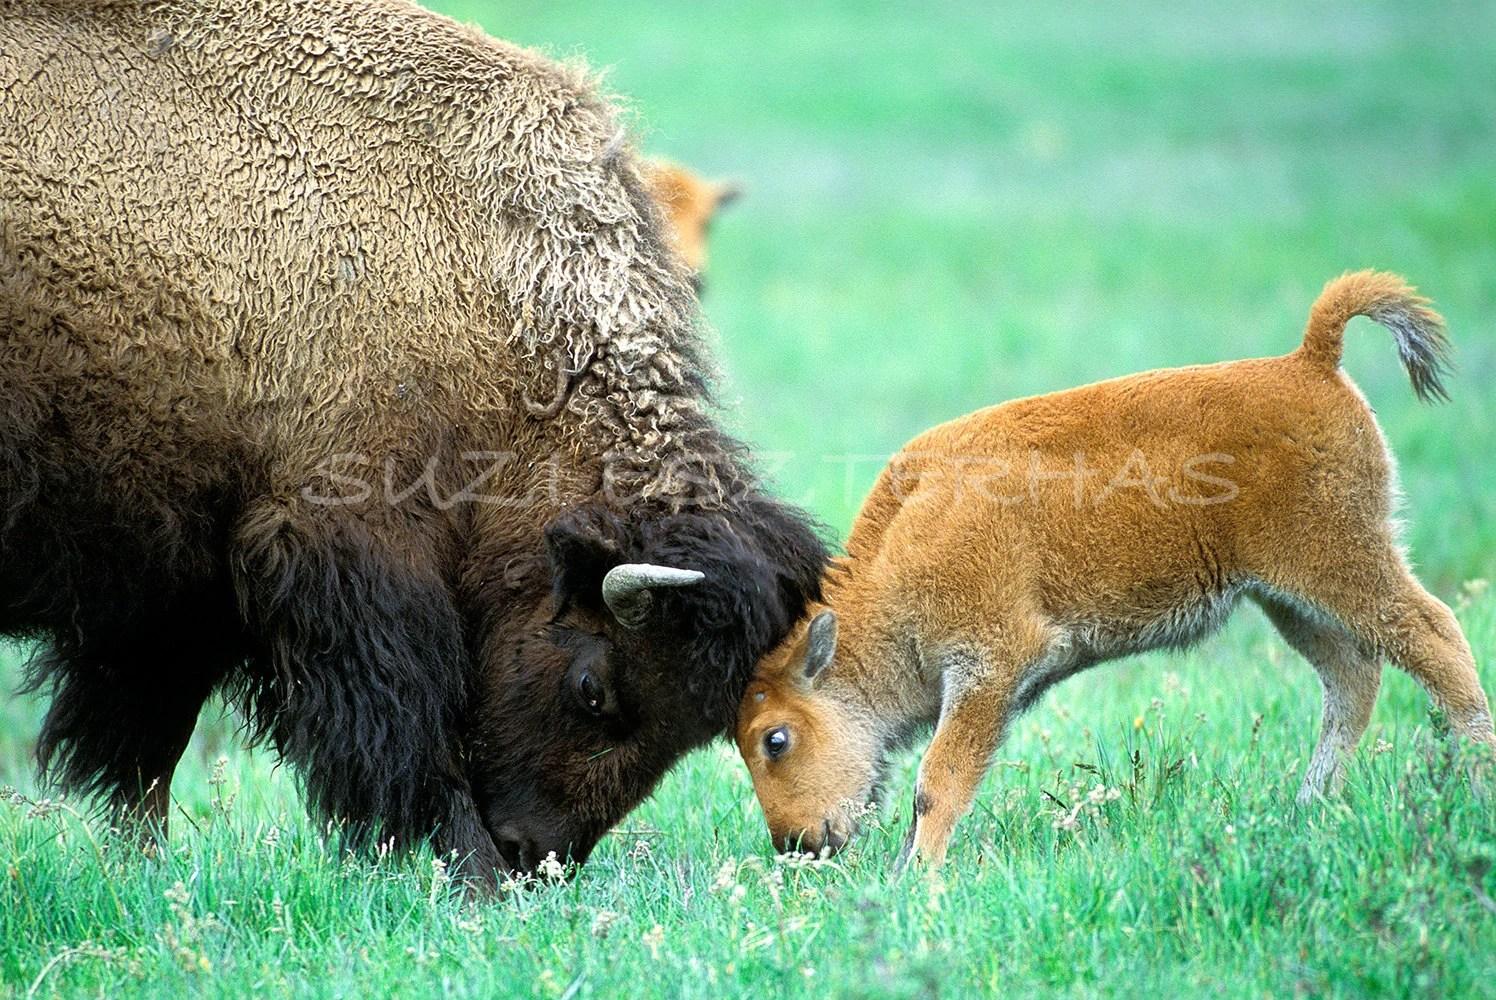 Mom And Baby Animal Photography Baby Bison And Mom Play